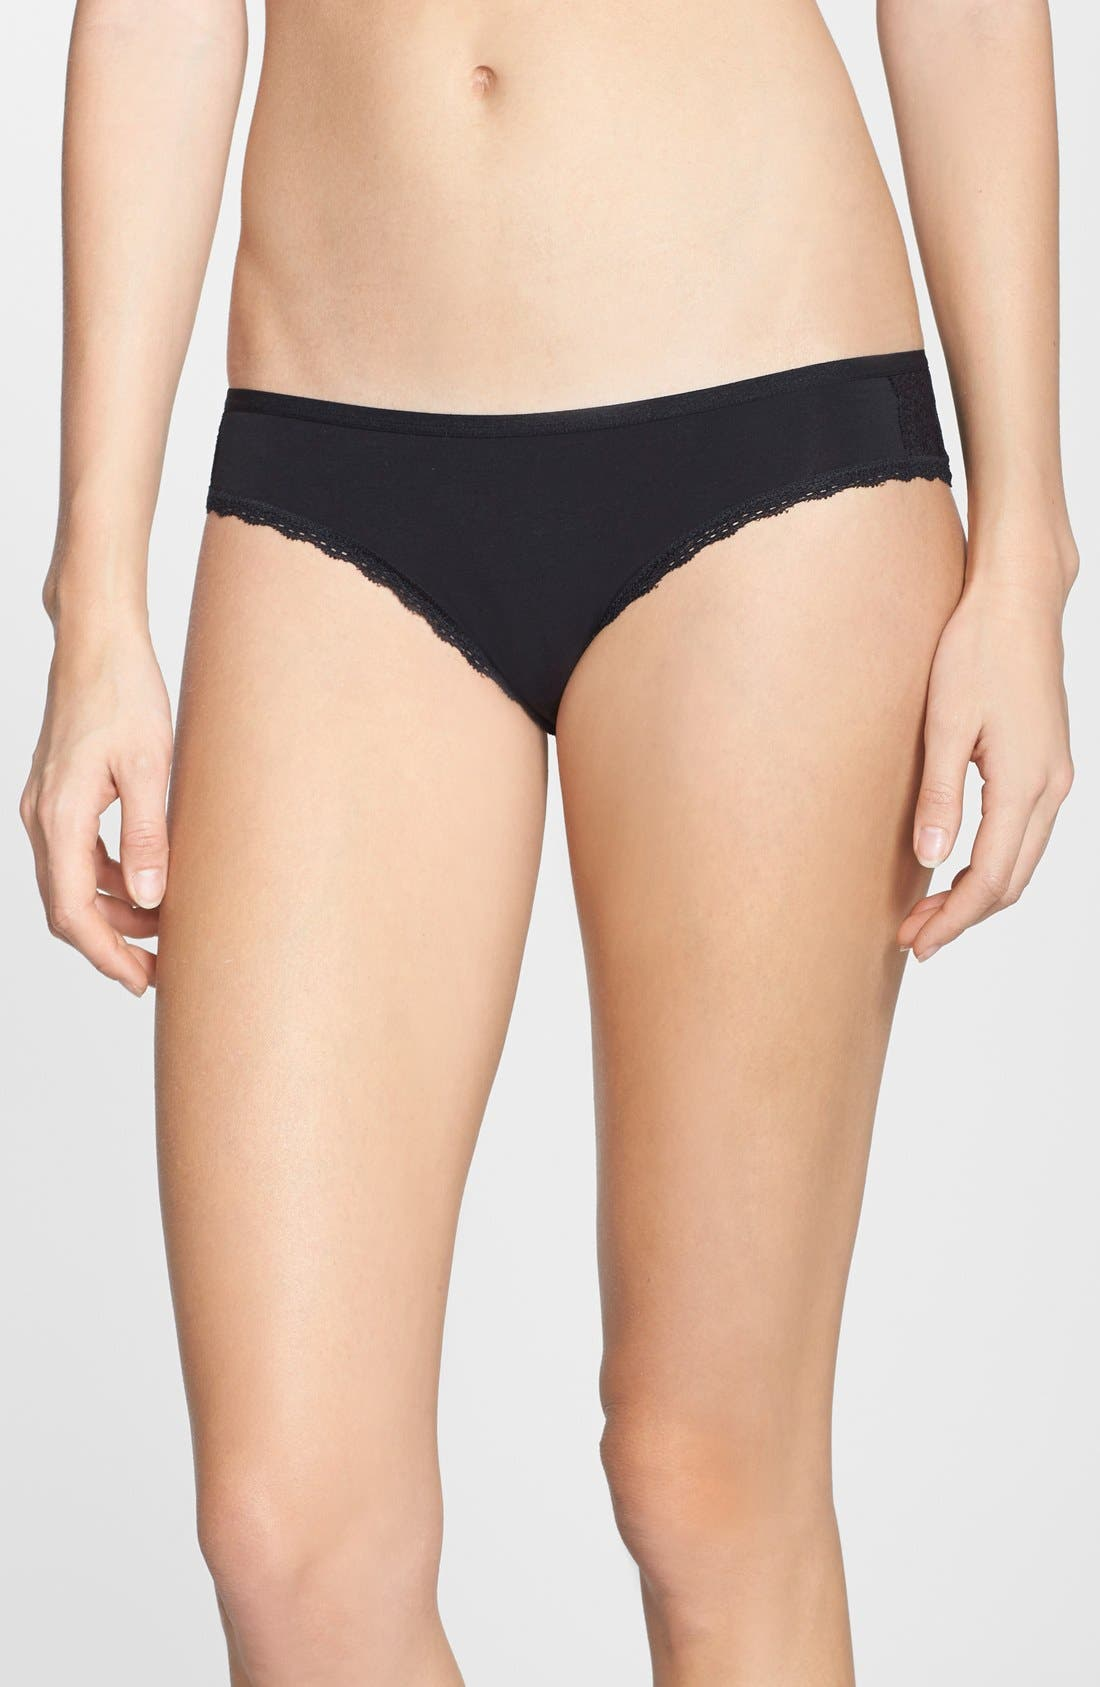 h.dew Jessi Bikini (Regular & Plus Size)